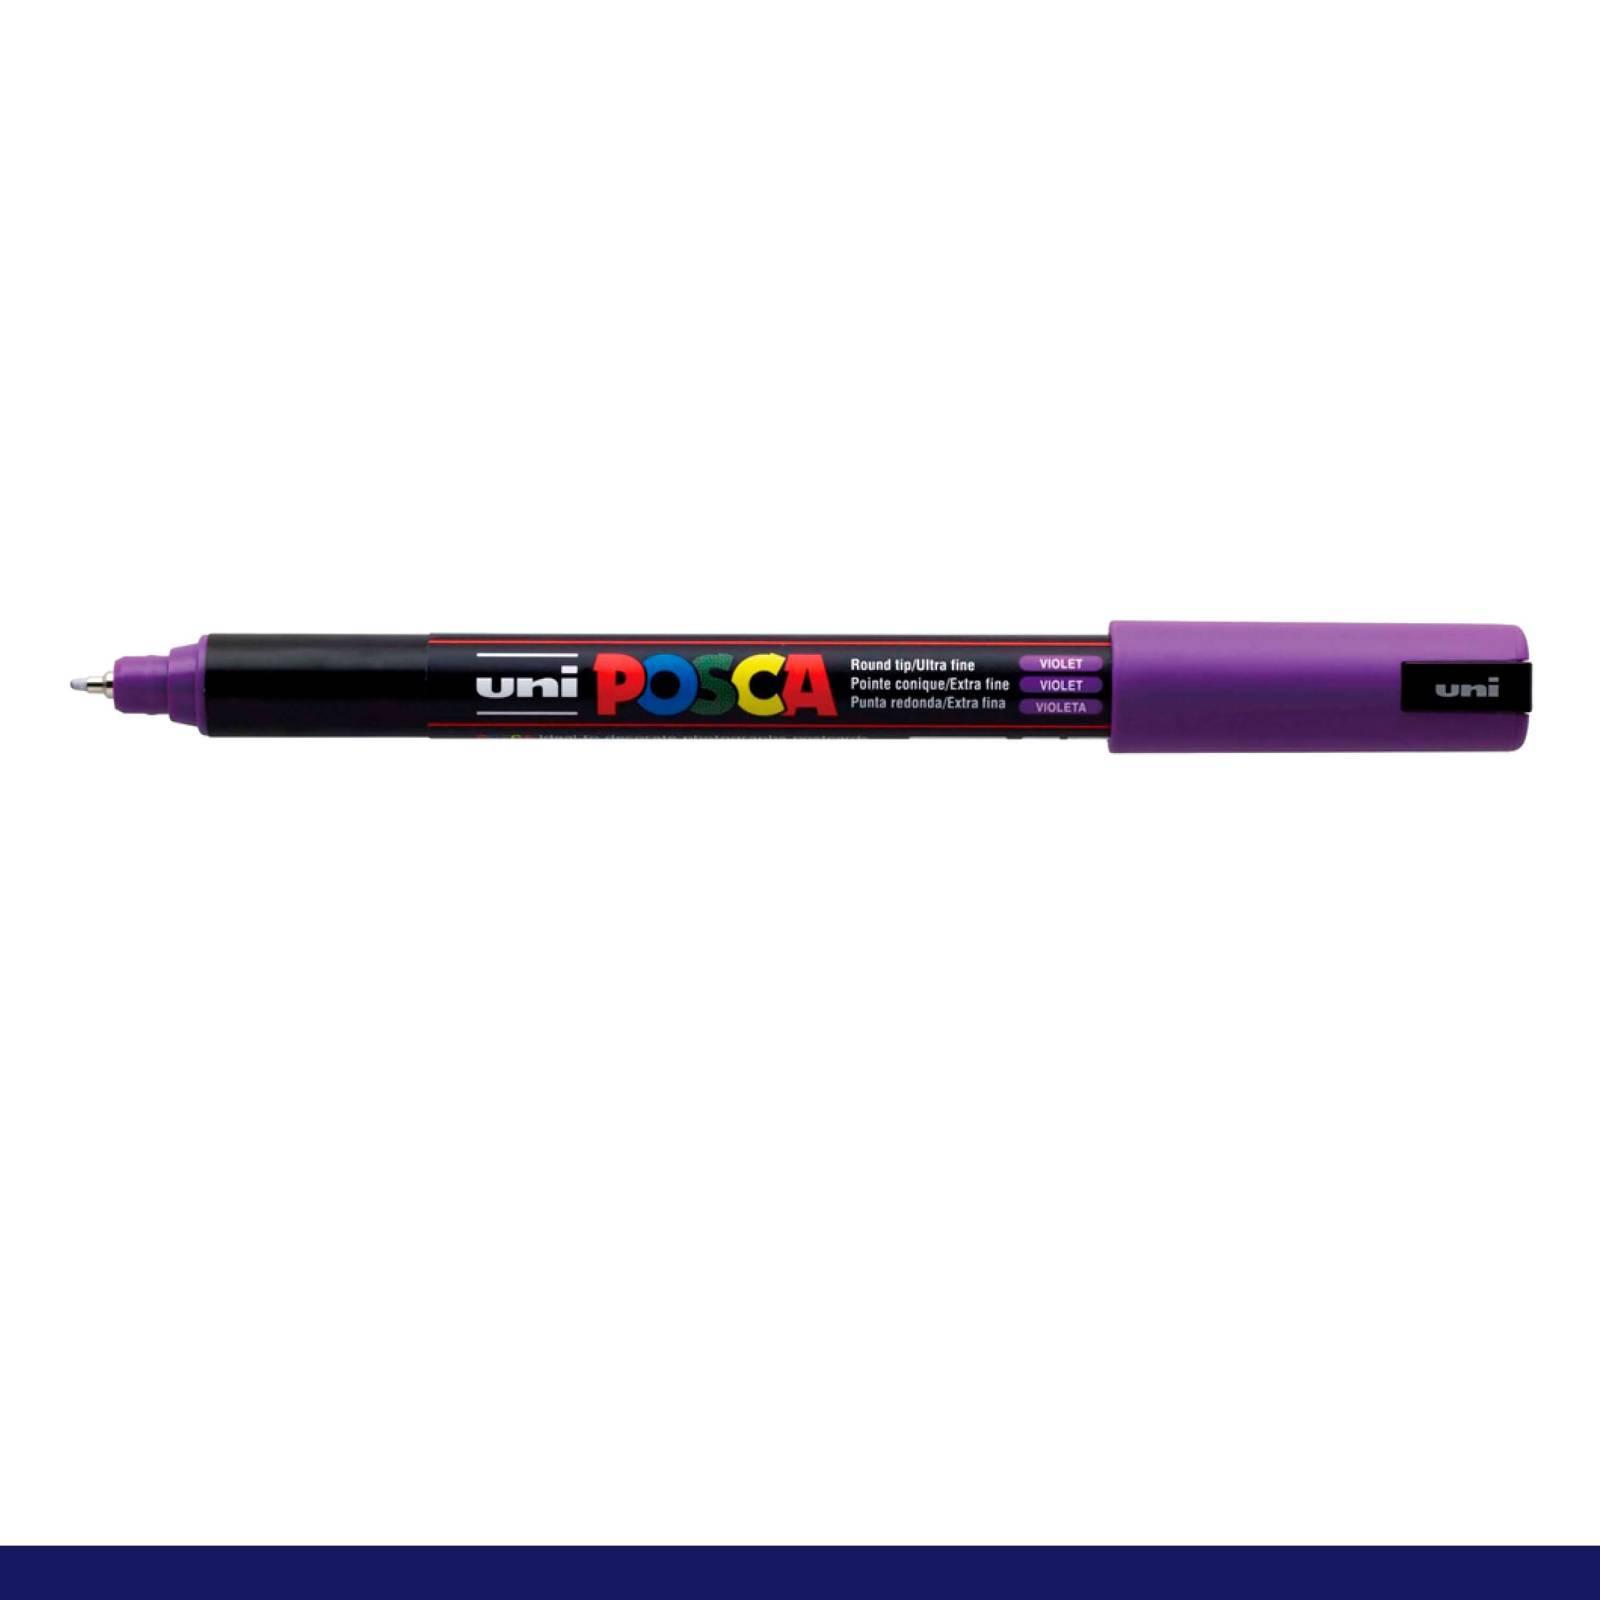 Caneta Posca PC 1MR Violeta